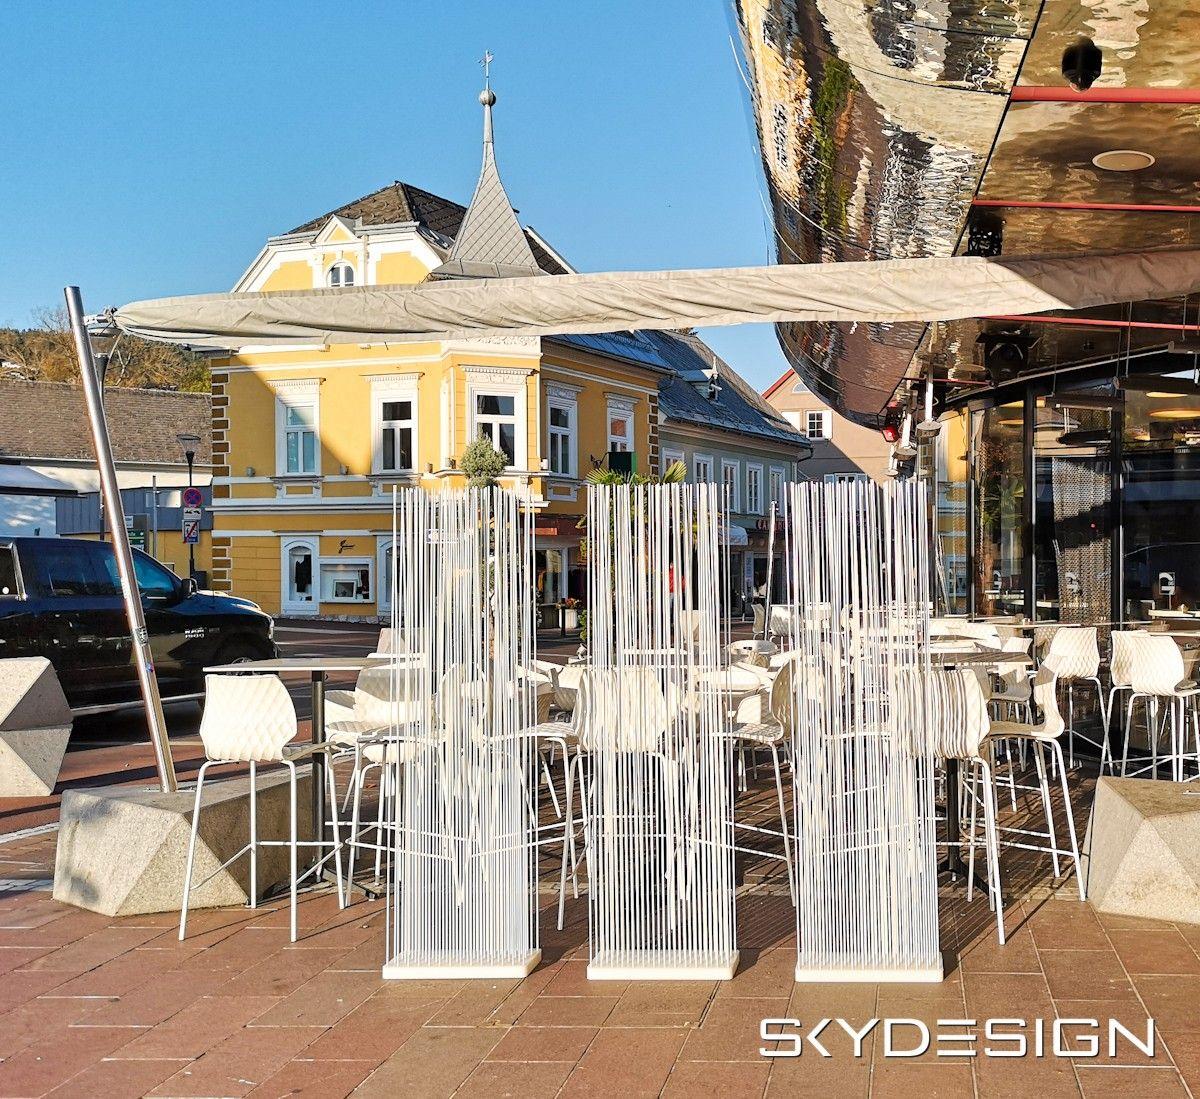 Full Size of Outdoor Paravent Balkon Metall Holz Shades Of Venice 180 Cm Hoch 2m Ikea Garten Küche Kaufen Edelstahl Wohnzimmer Outdoor Paravent